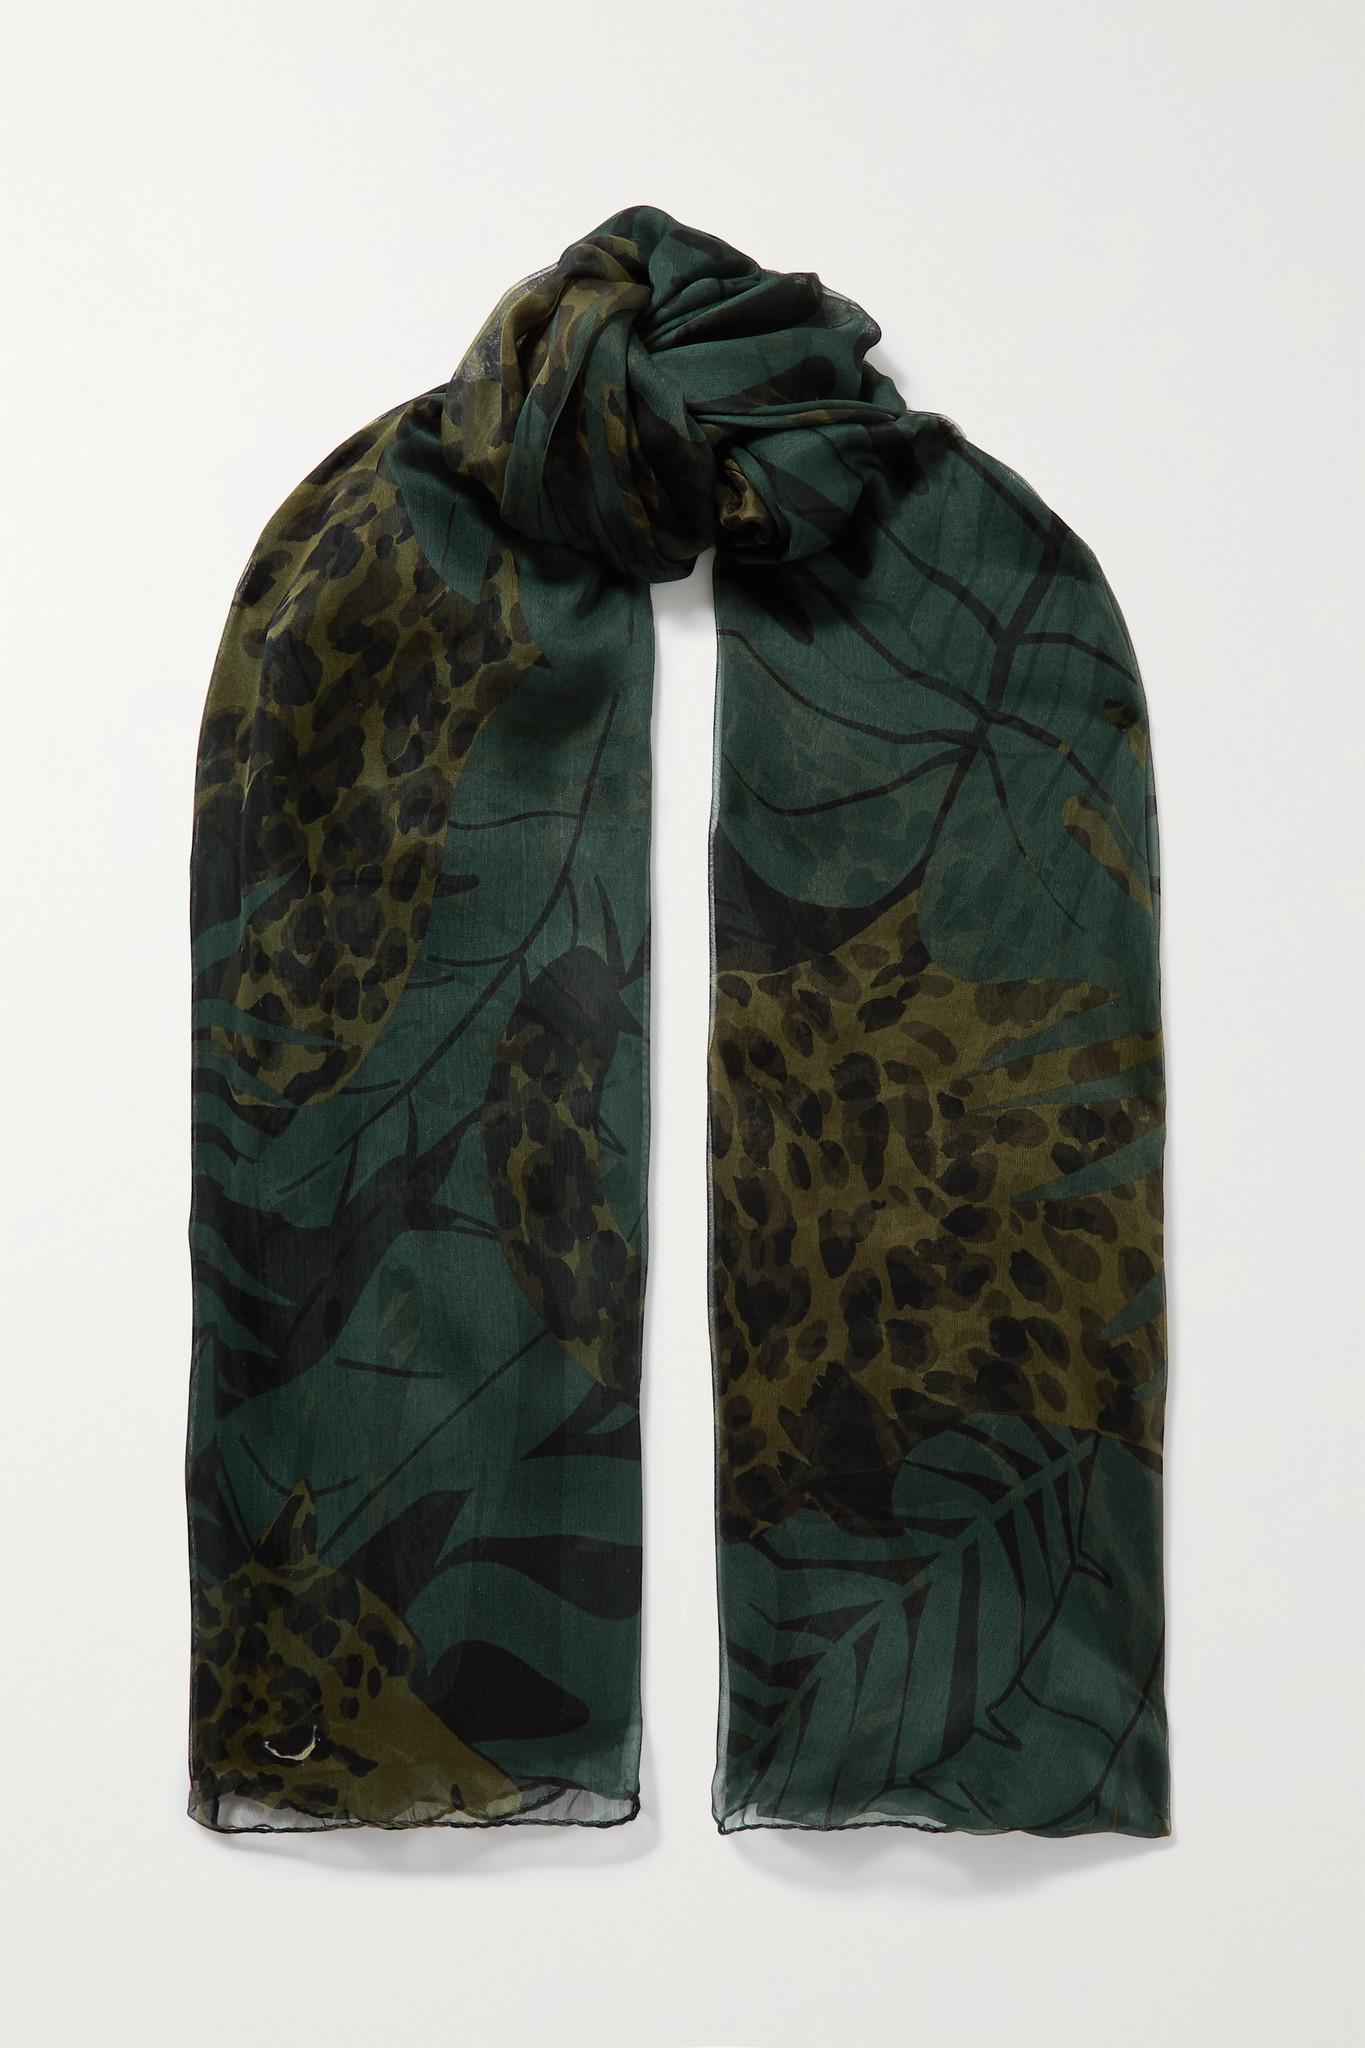 SAINT LAURENT - Printed Silk-chiffon Scarf - Green - one size